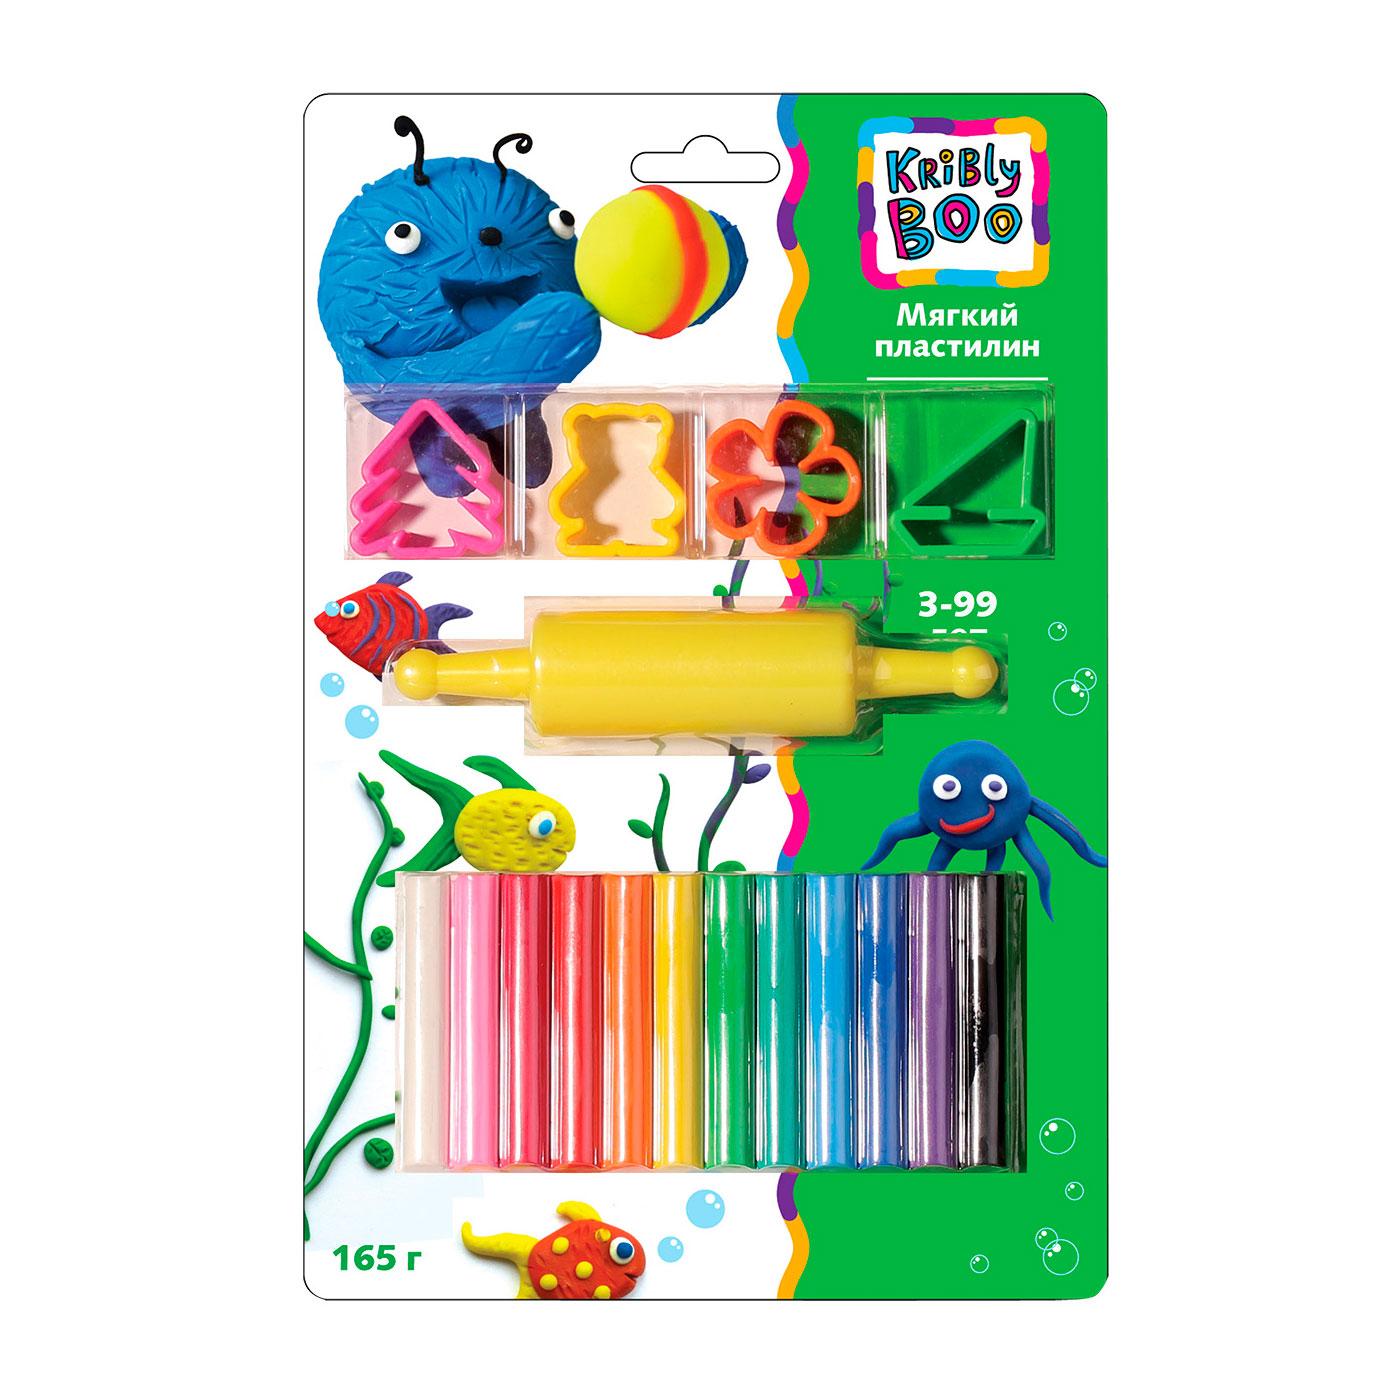 Пластилин Kribly Boo Мягкий с формочками и роликом 165 грамм 12 штук